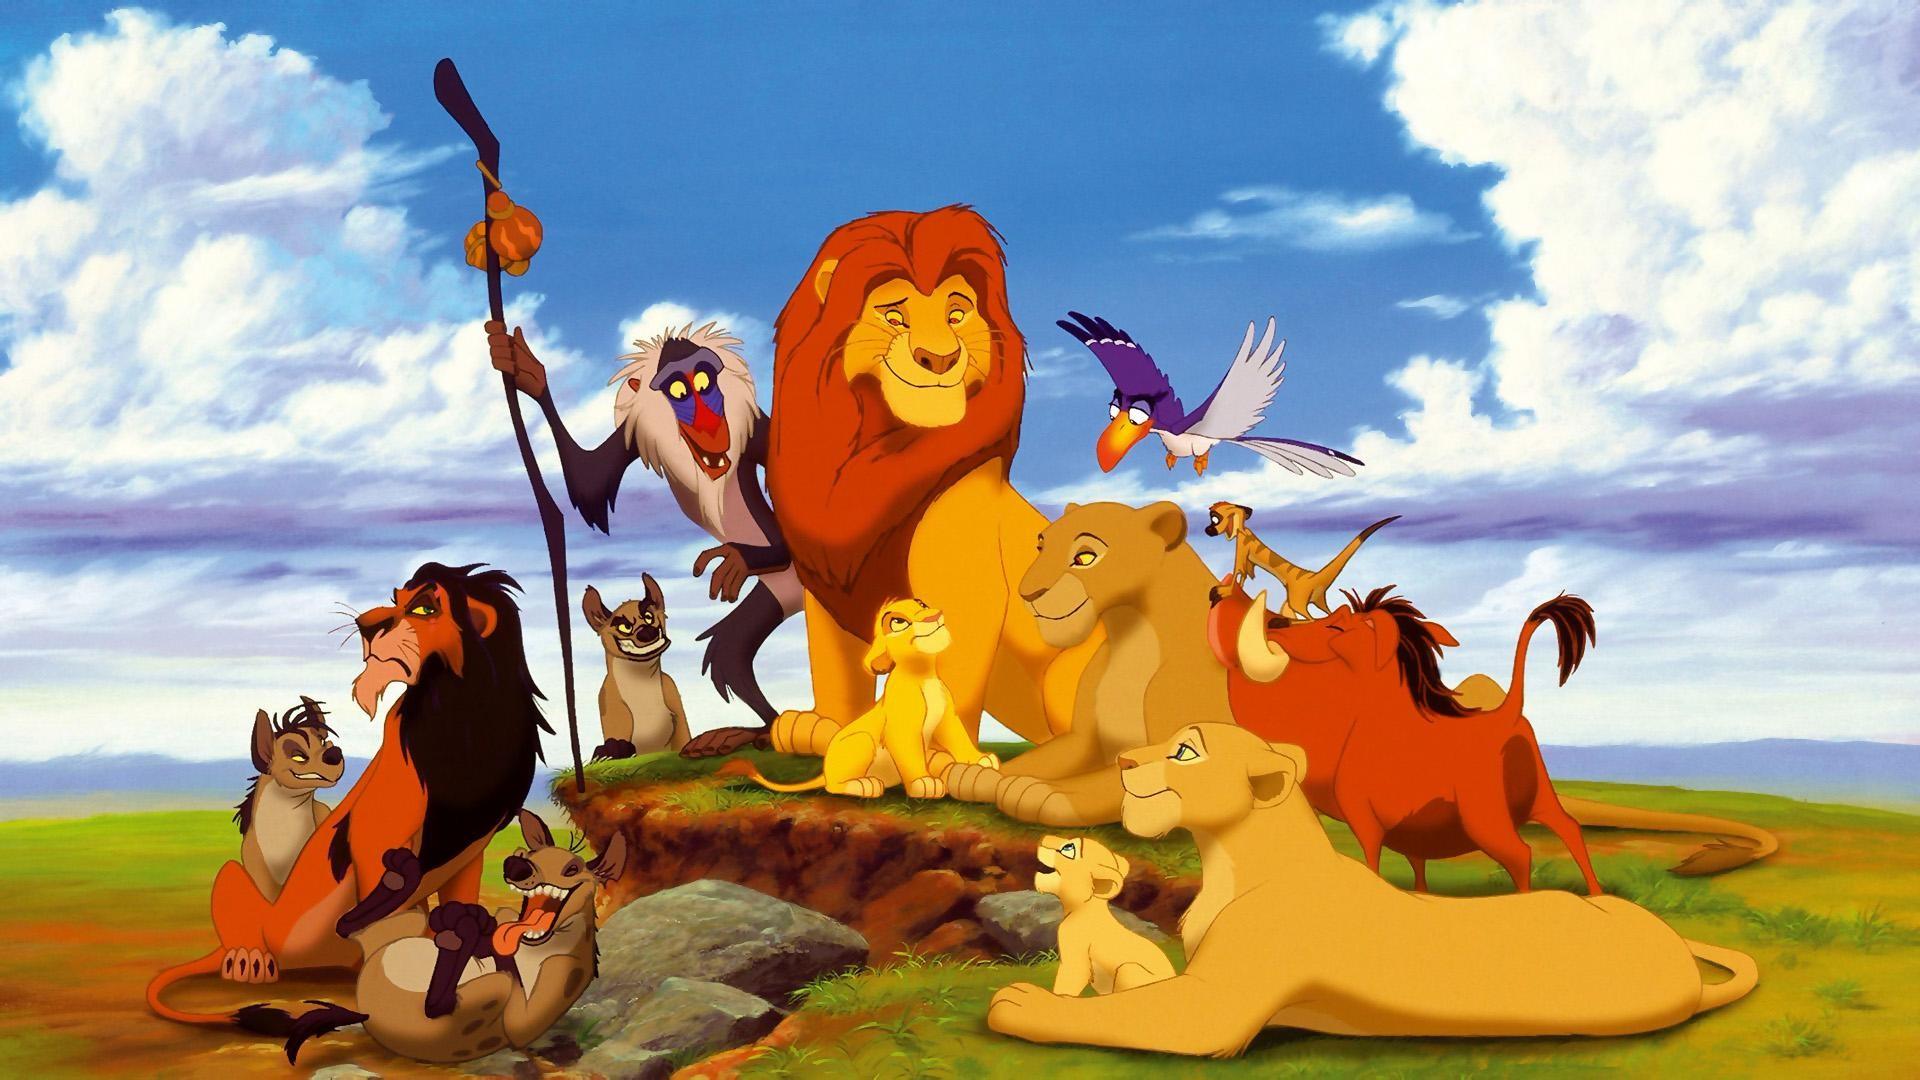 Cartoon Lion King wallpaper